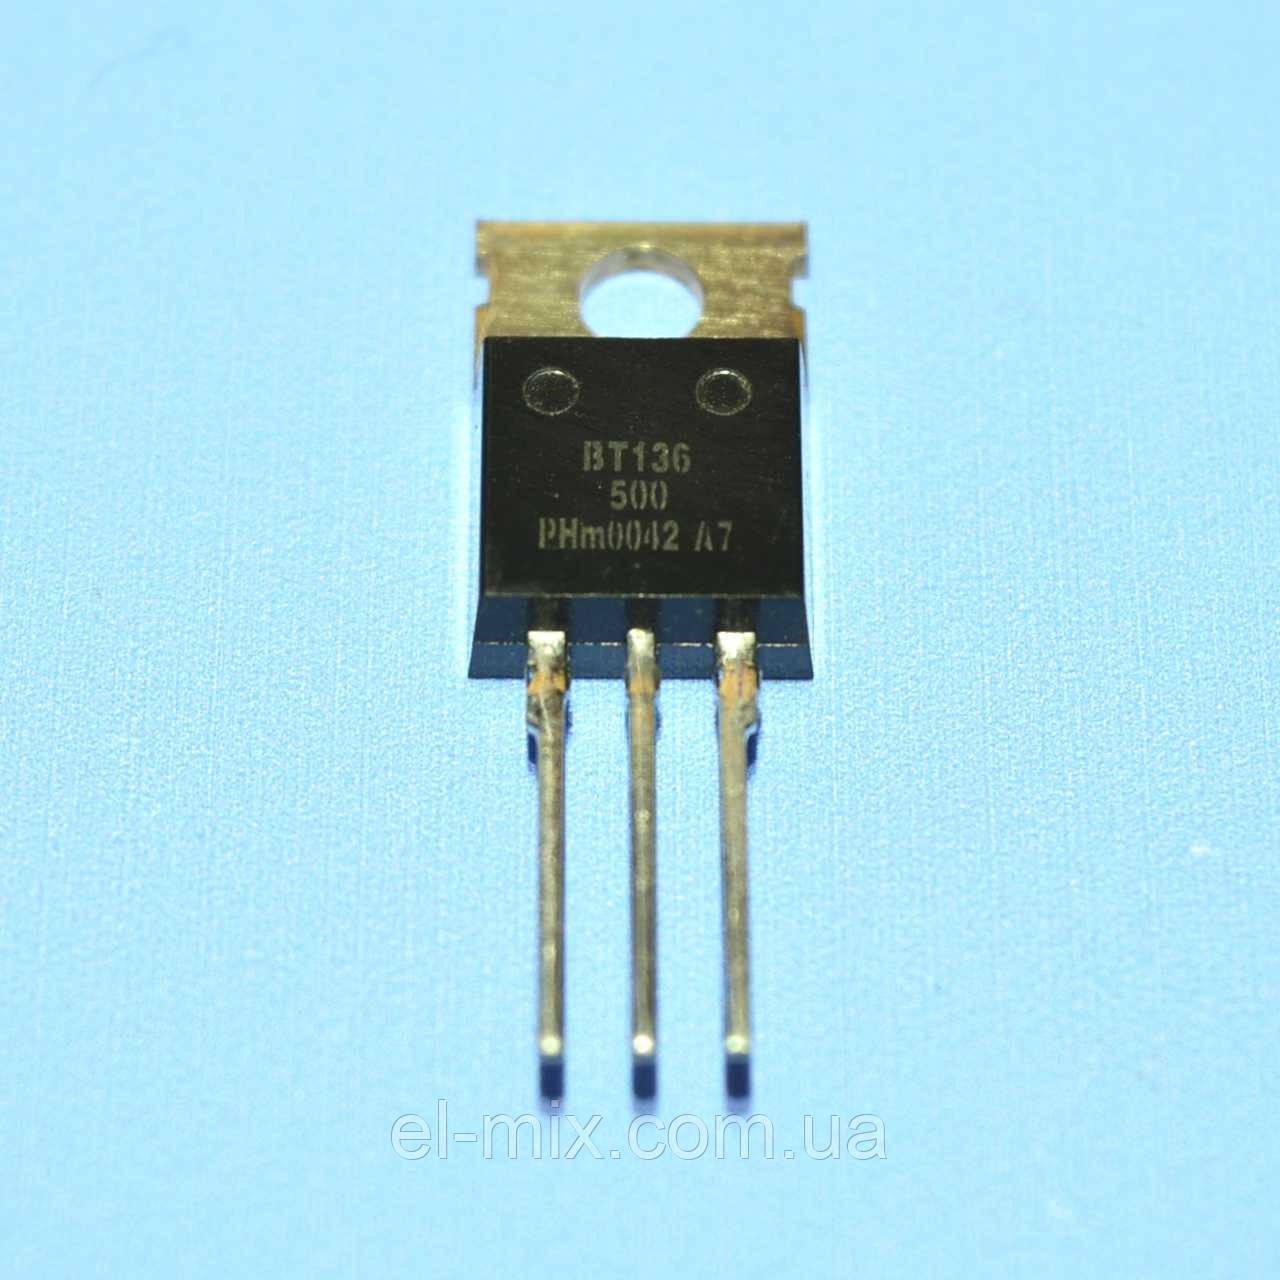 Симистор BT136-500  TO-220  Philips